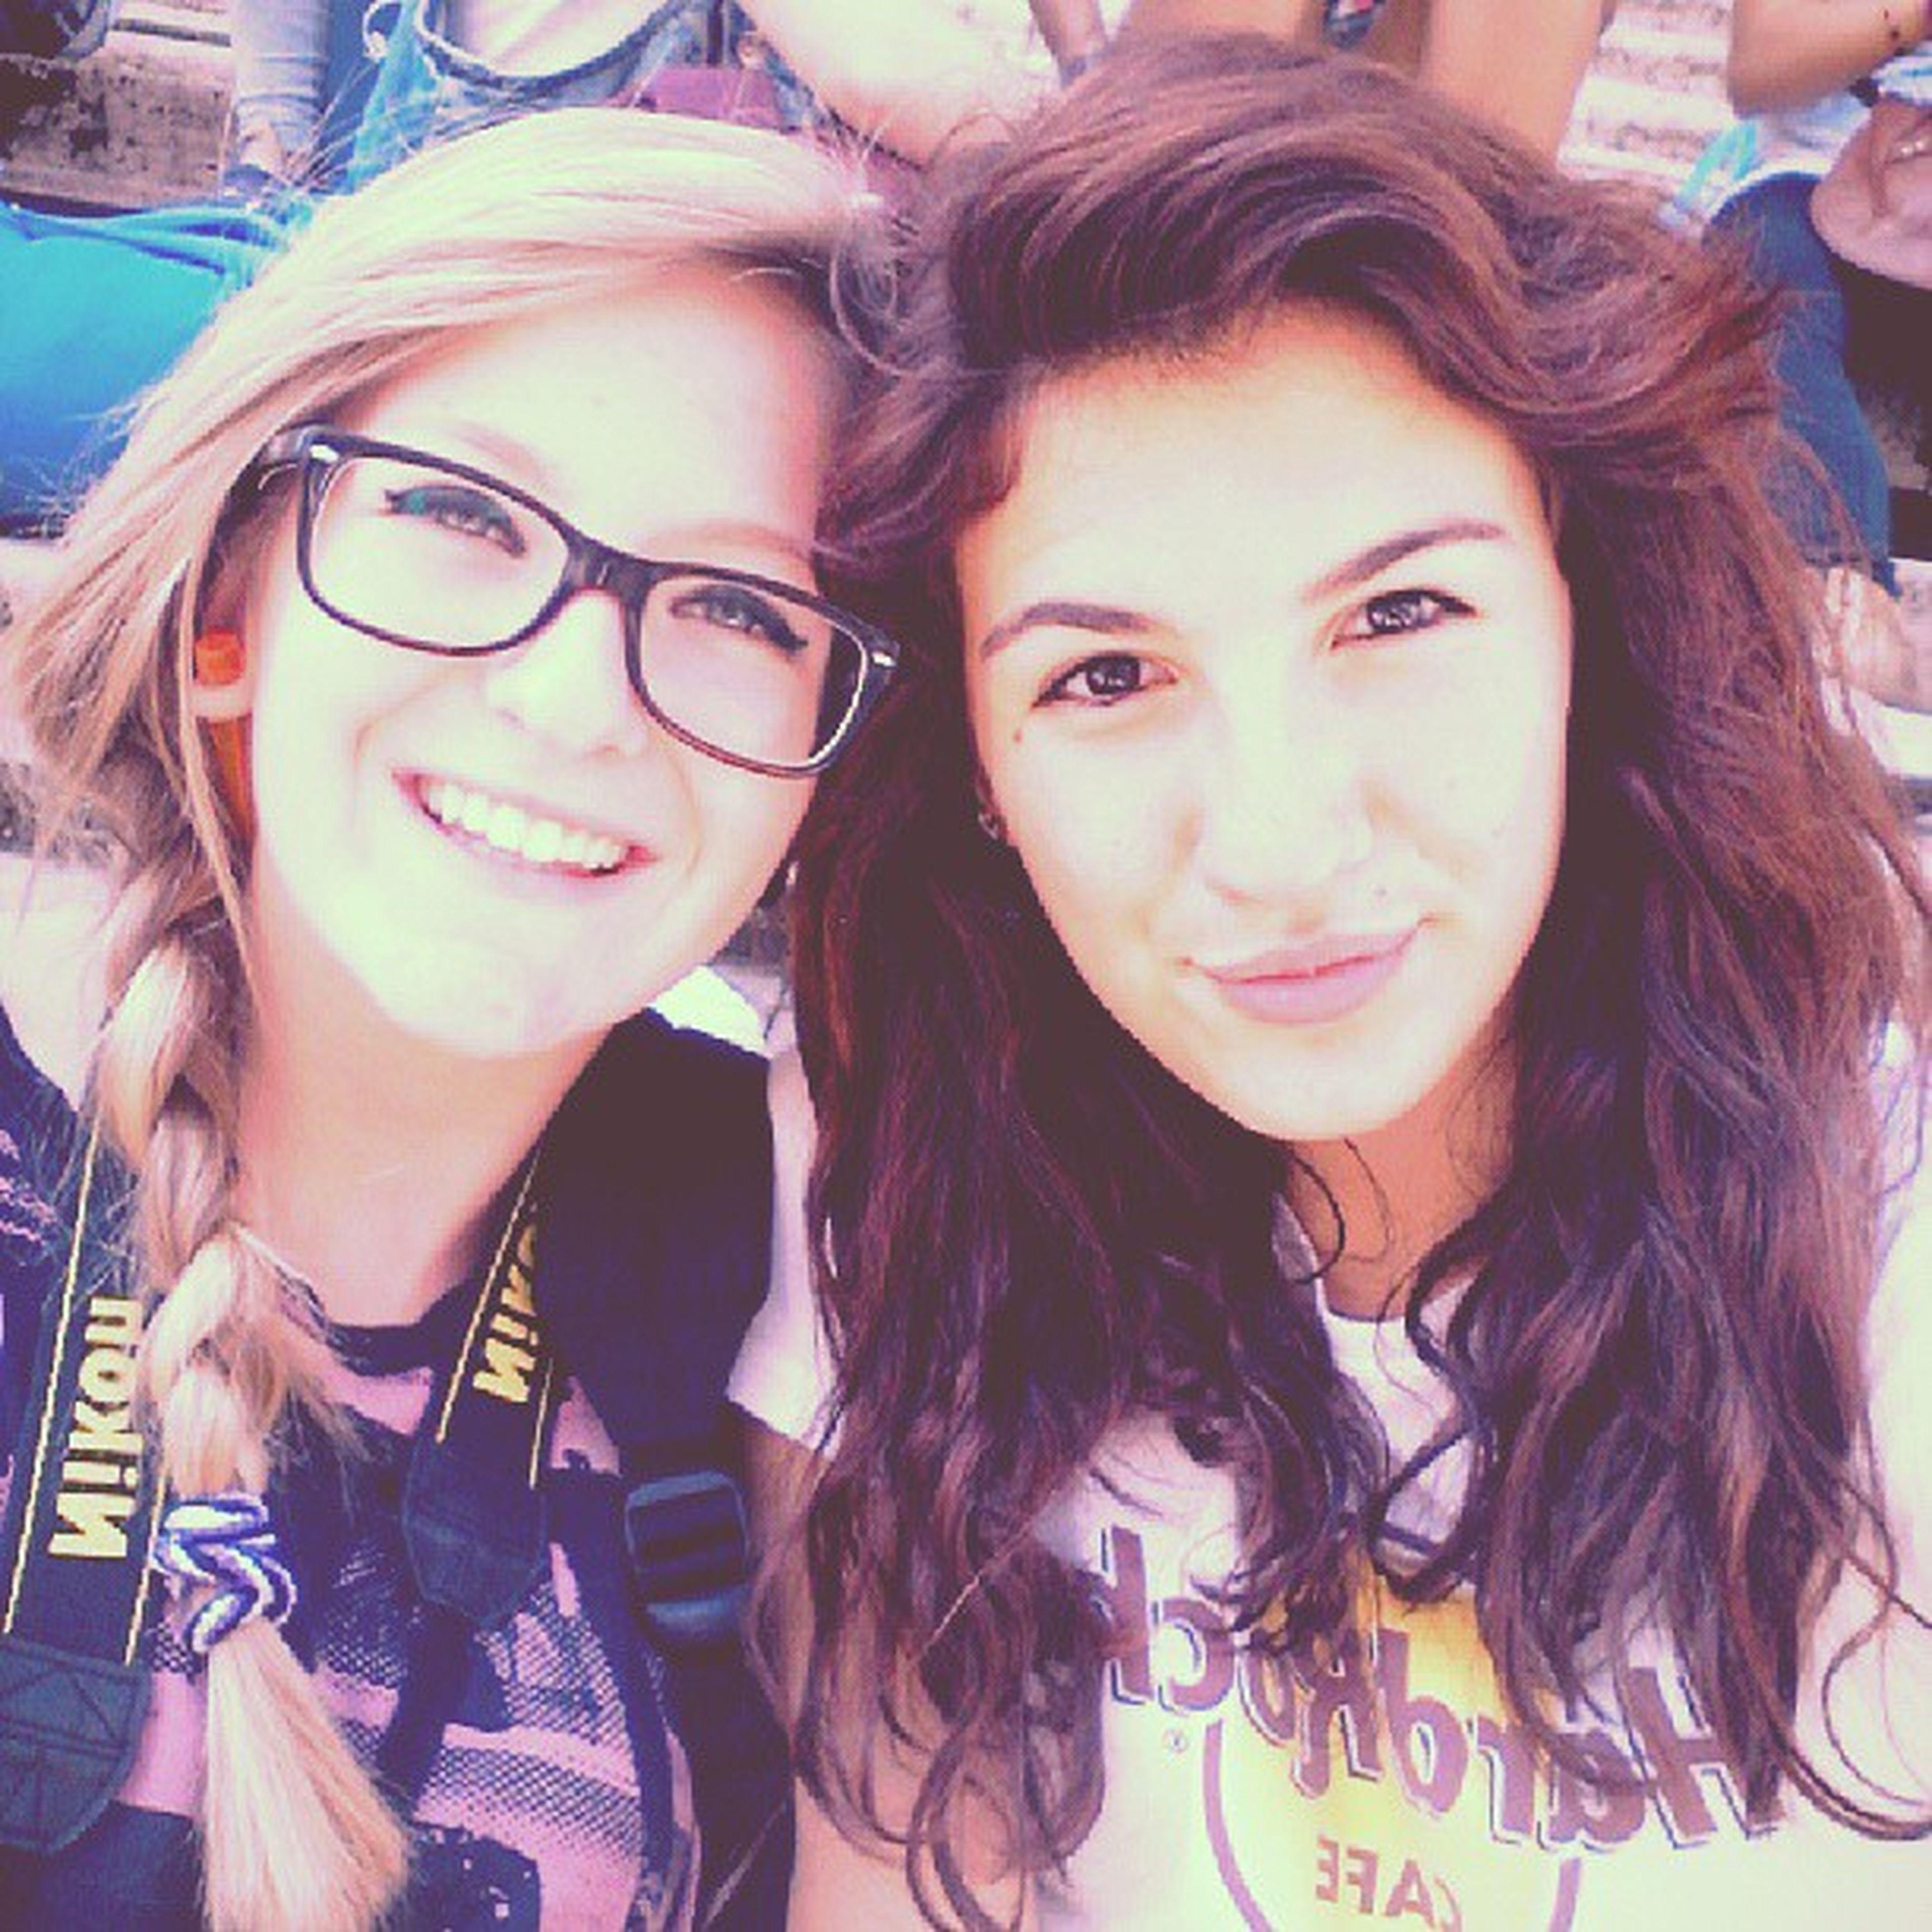 Rome Goldengala Beautifulday Friendship girls